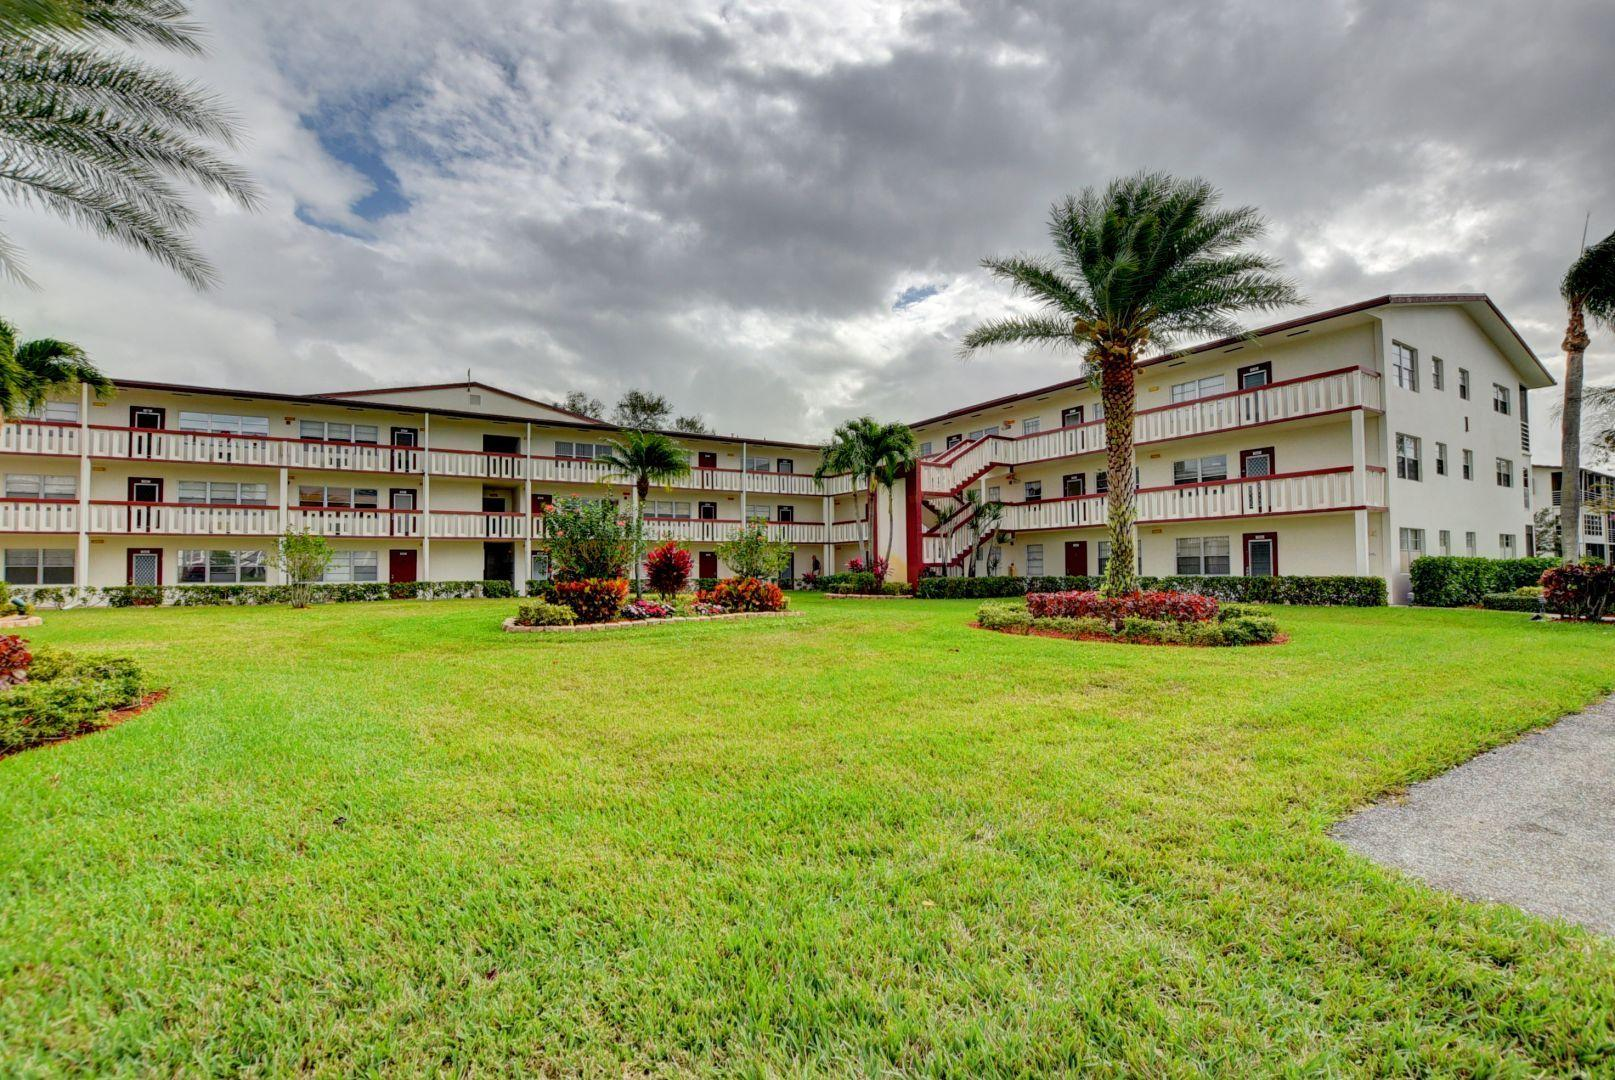 361 Fanshaw I, Boca Raton, Florida 33434, 2 Bedrooms Bedrooms, ,1.1 BathroomsBathrooms,Condo/Coop,For Rent,Fanshaw I,2,RX-10656796